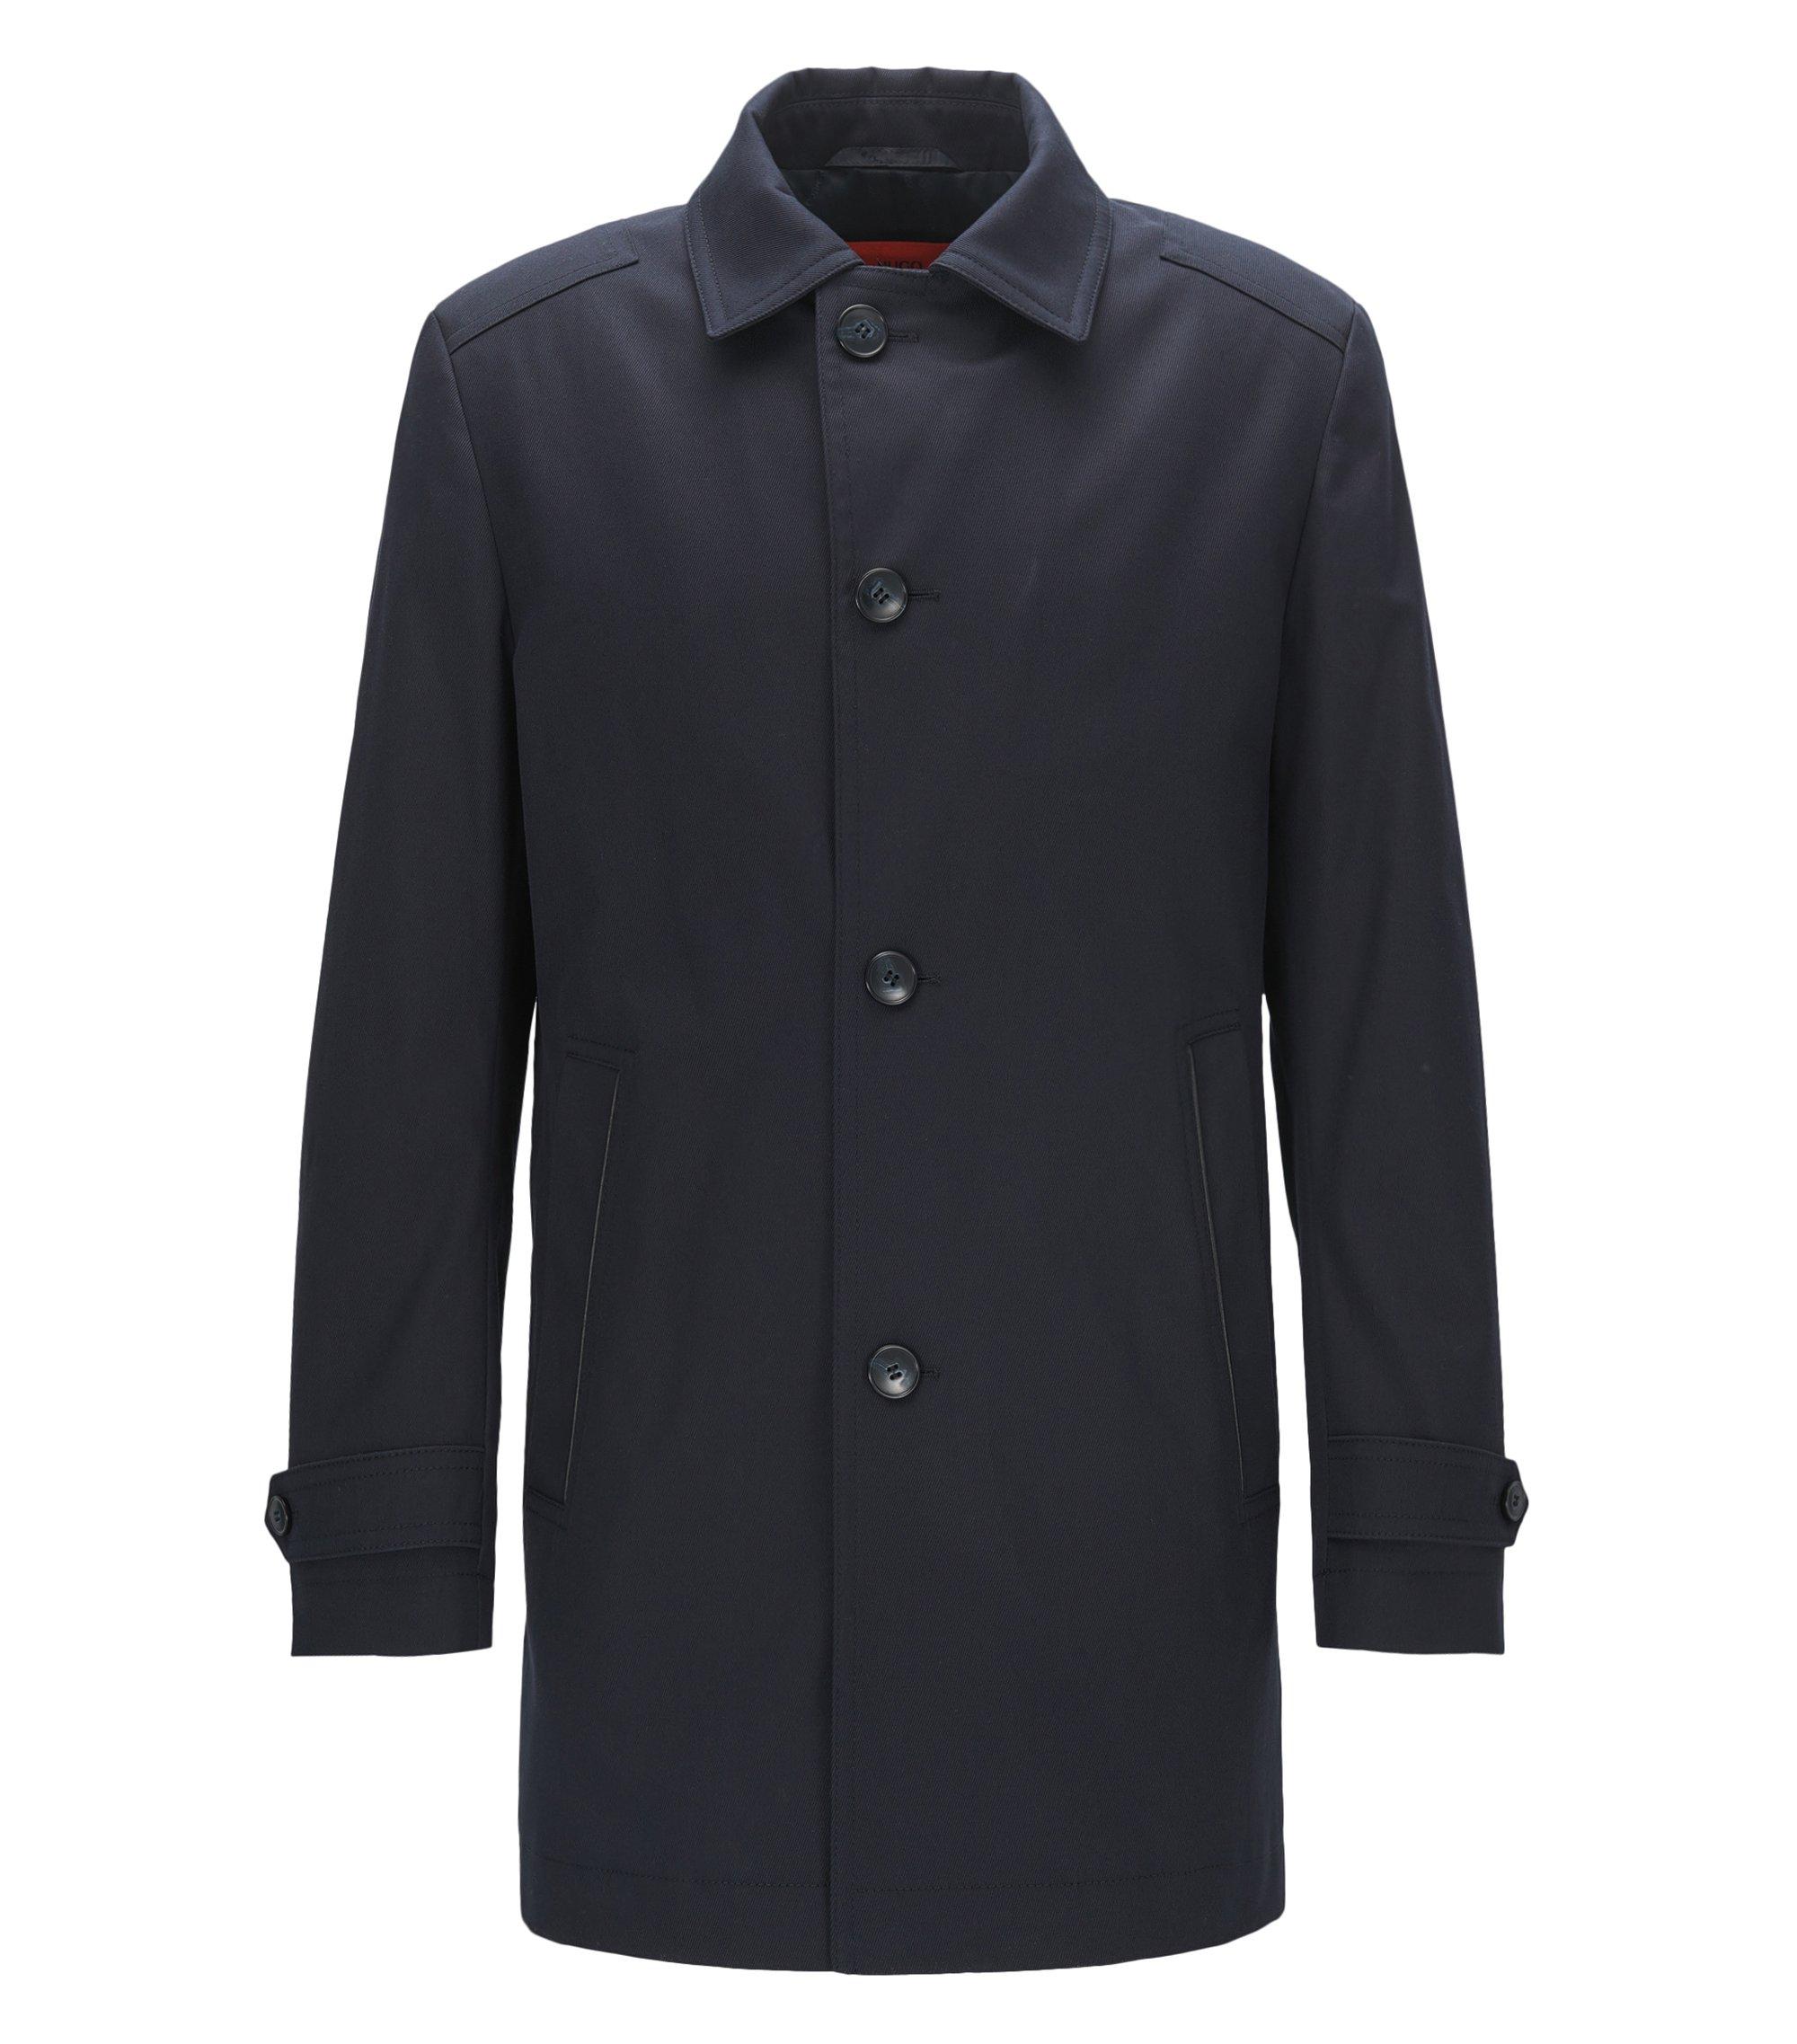 Abrigo regular fit en algodón elástico repelente al agua, Azul oscuro